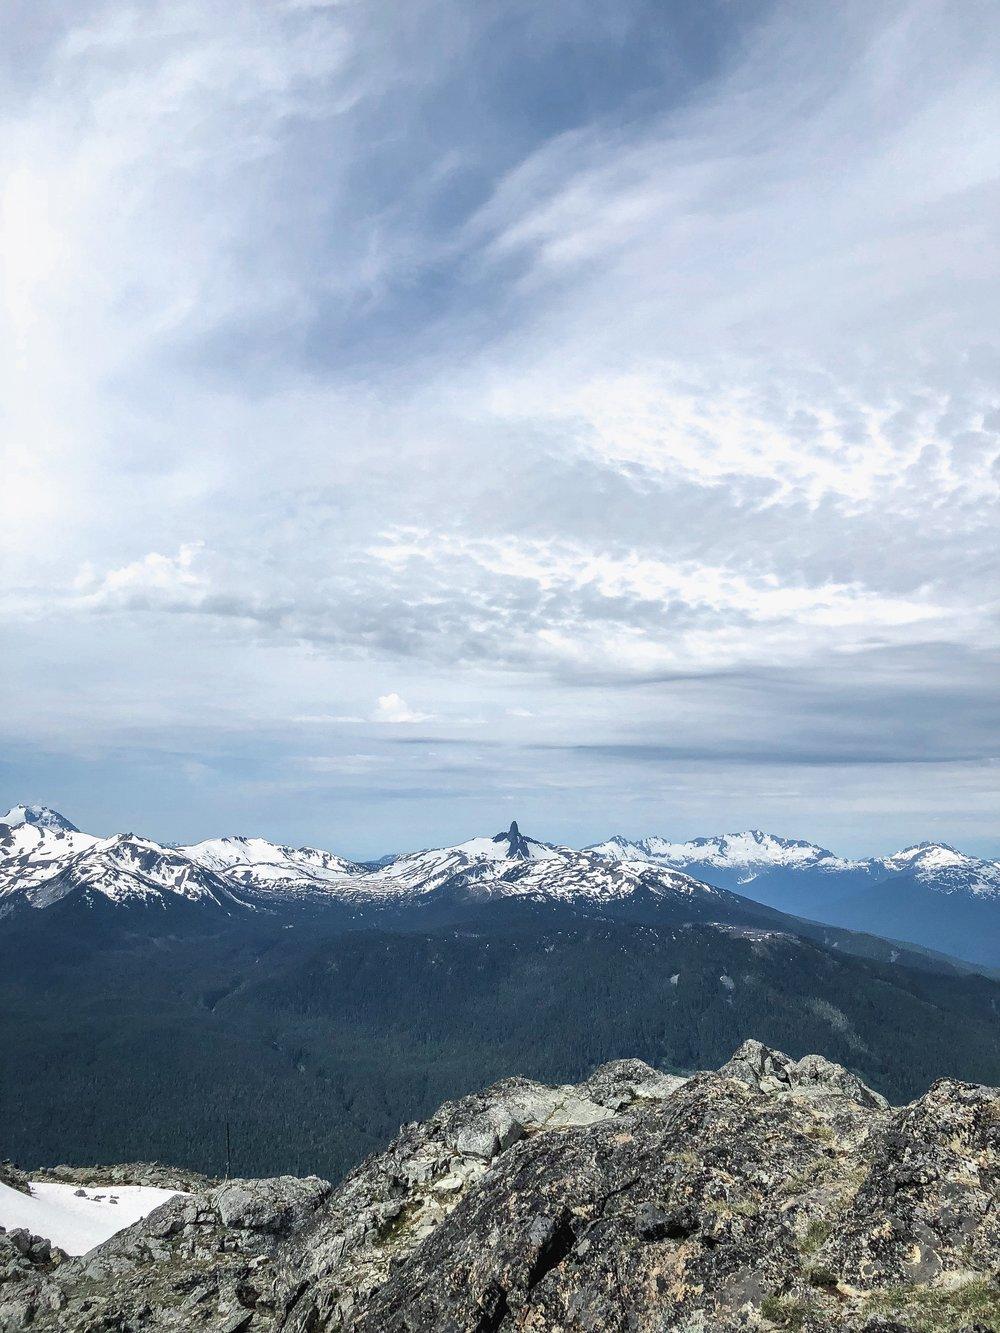 Blacktusk view from Whistler Peak Suspension Bridge